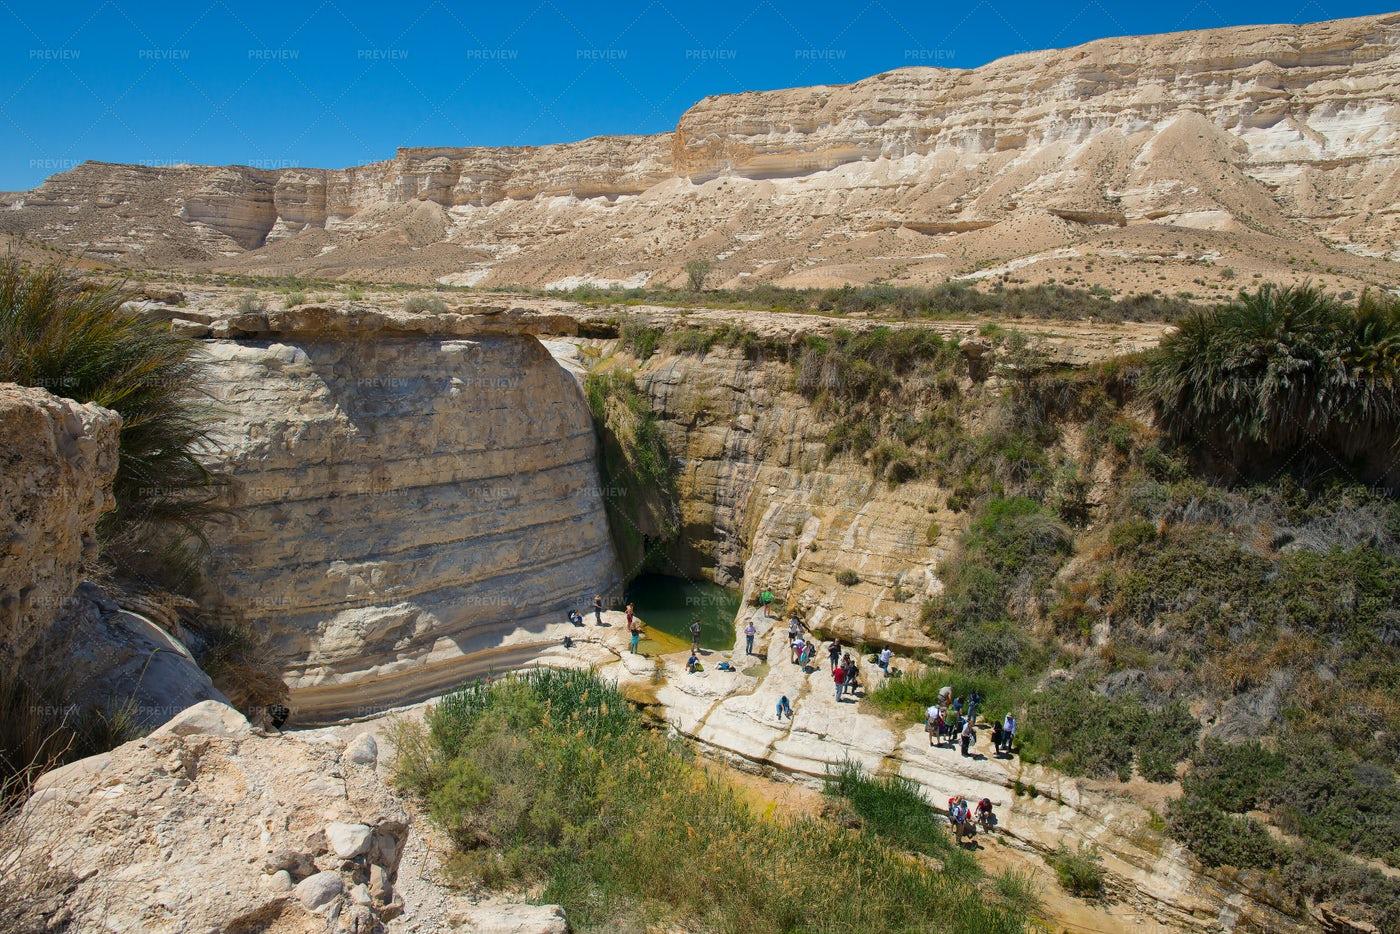 Negev Desert: Stock Photos